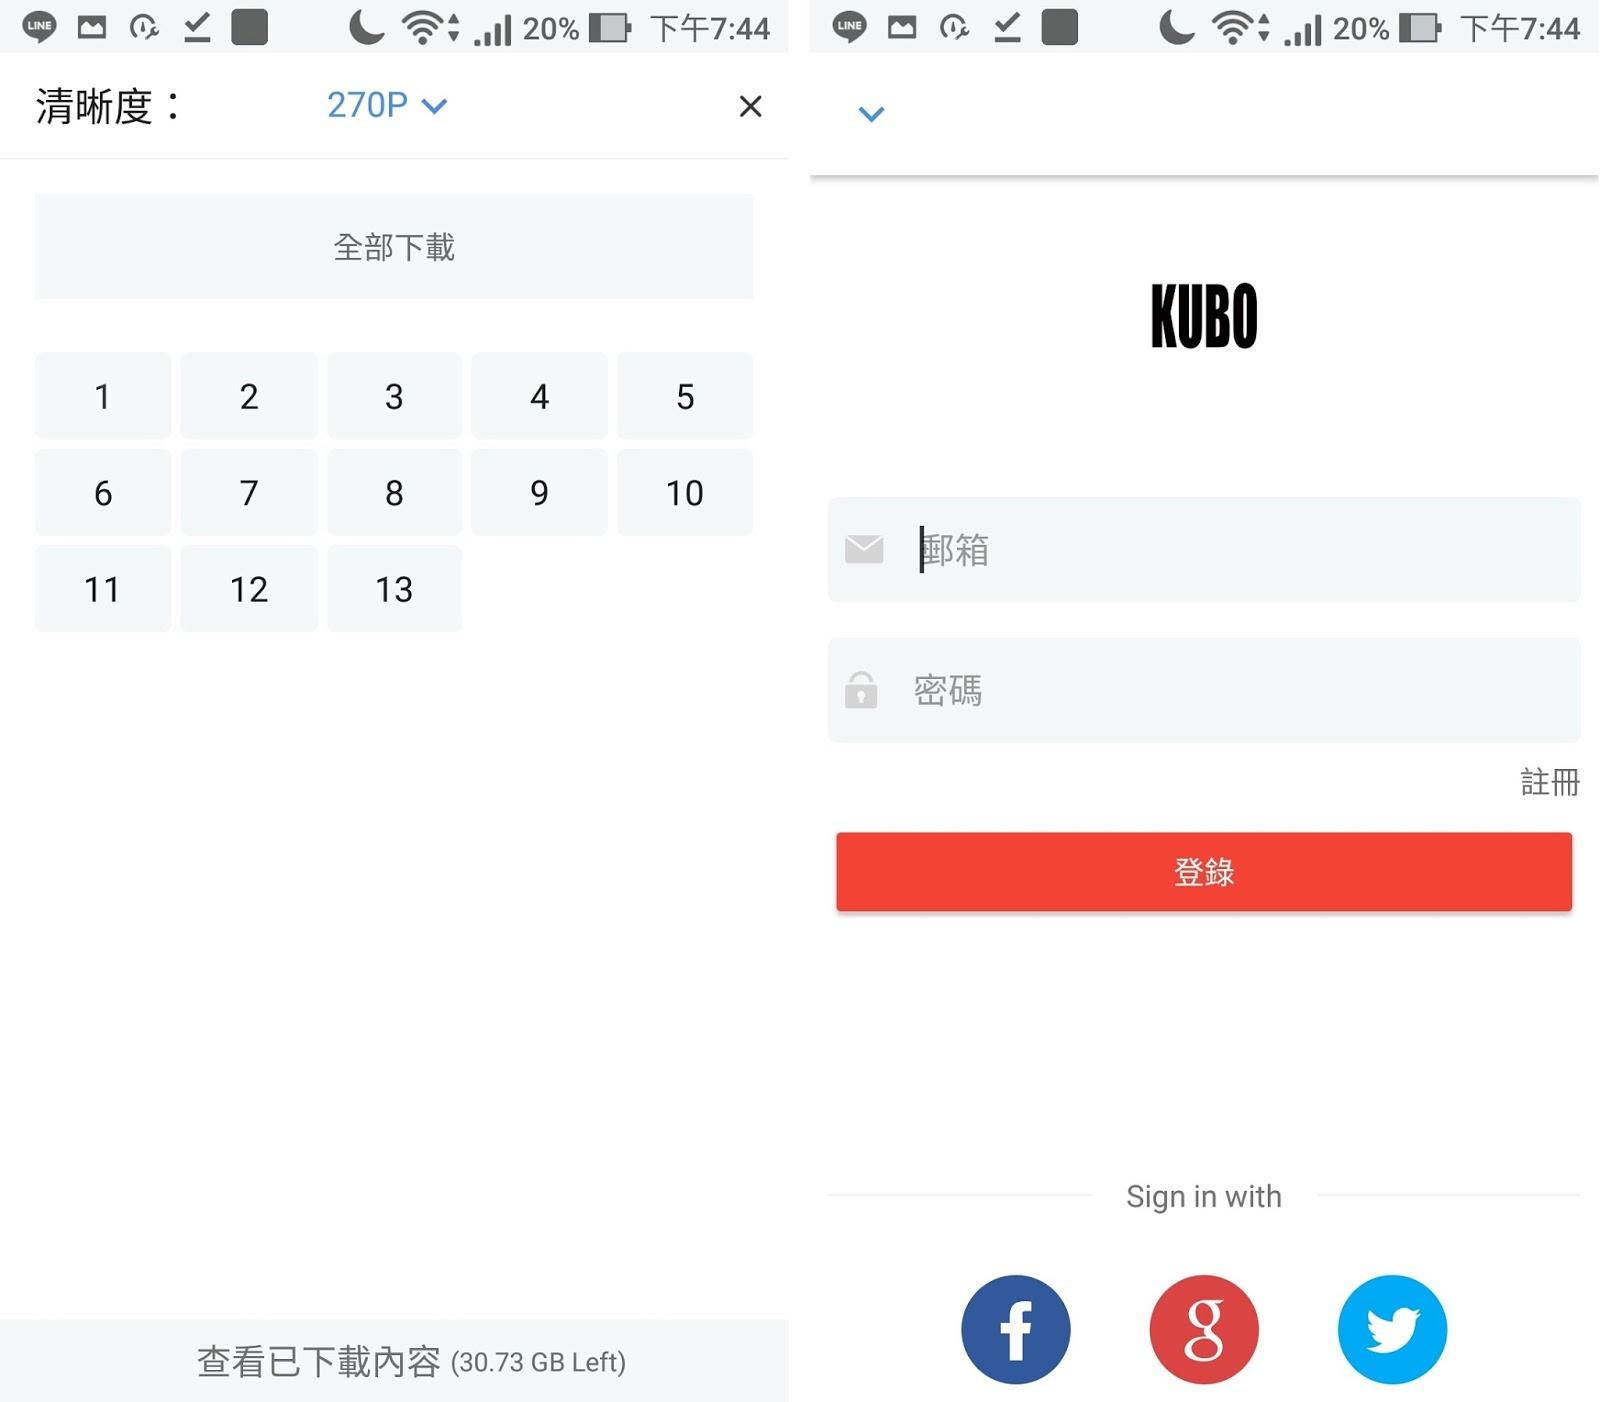 Screenshot 20170602 194430 - 酷播復活!《123Kubo》手機App,速度超快、片源豐富,還能下載離線撥放!